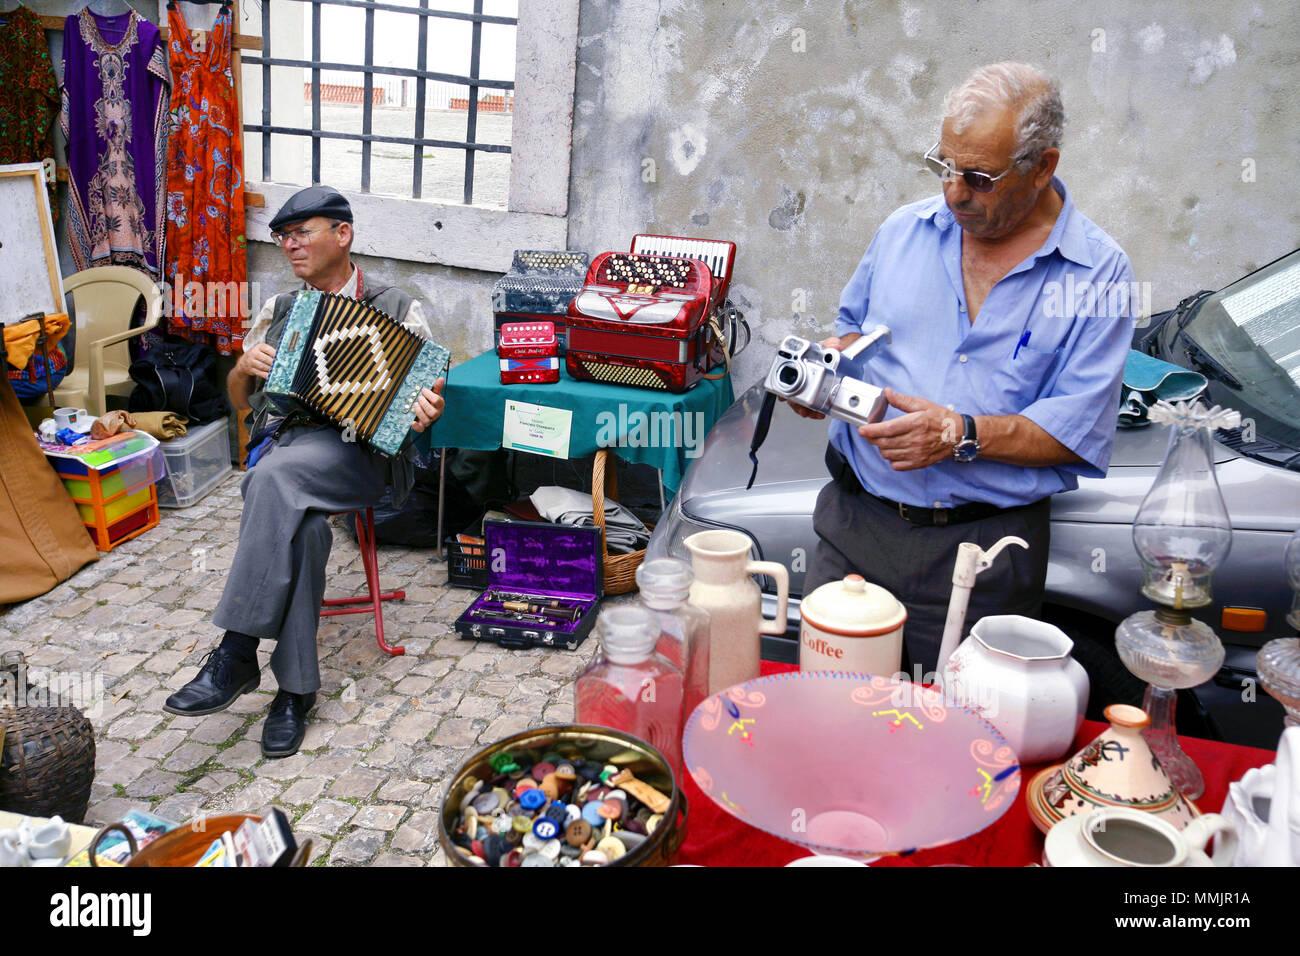 Feira da Ladra / Thieves flea market, Lisbon, Portugal - Stock Image